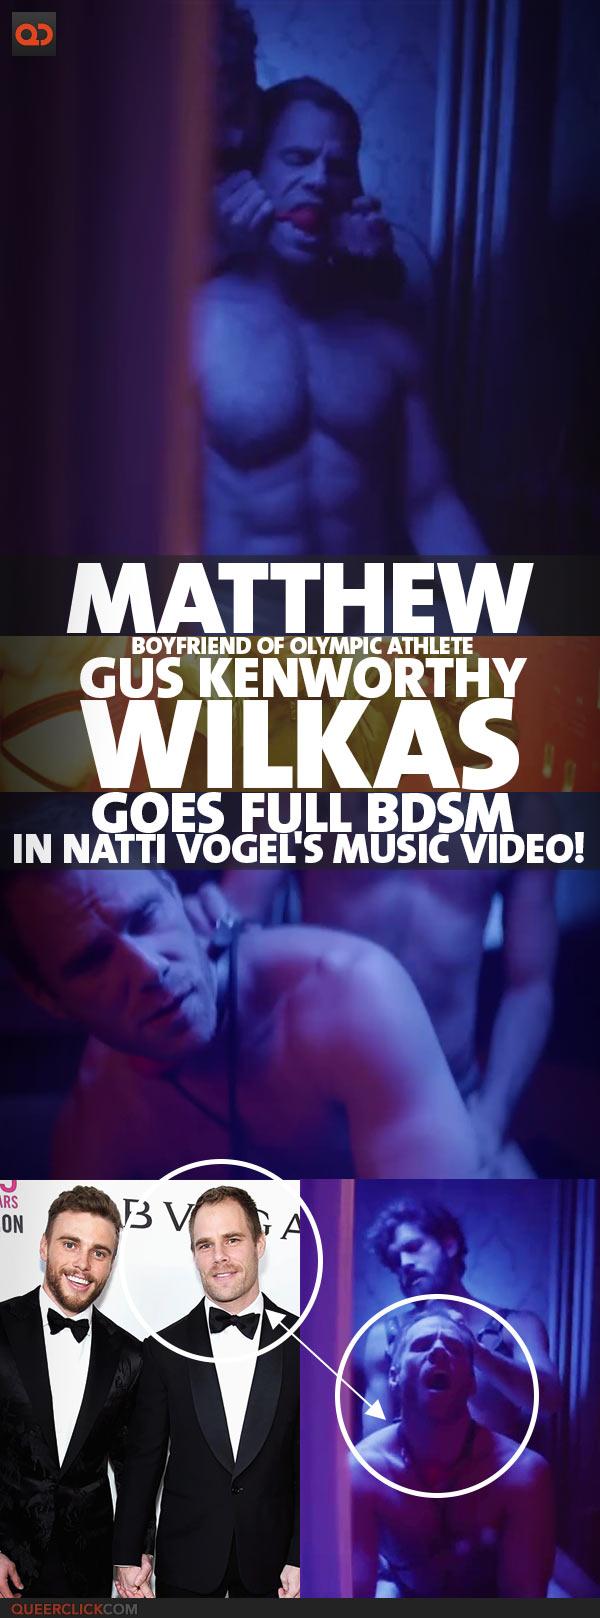 bdsm music video